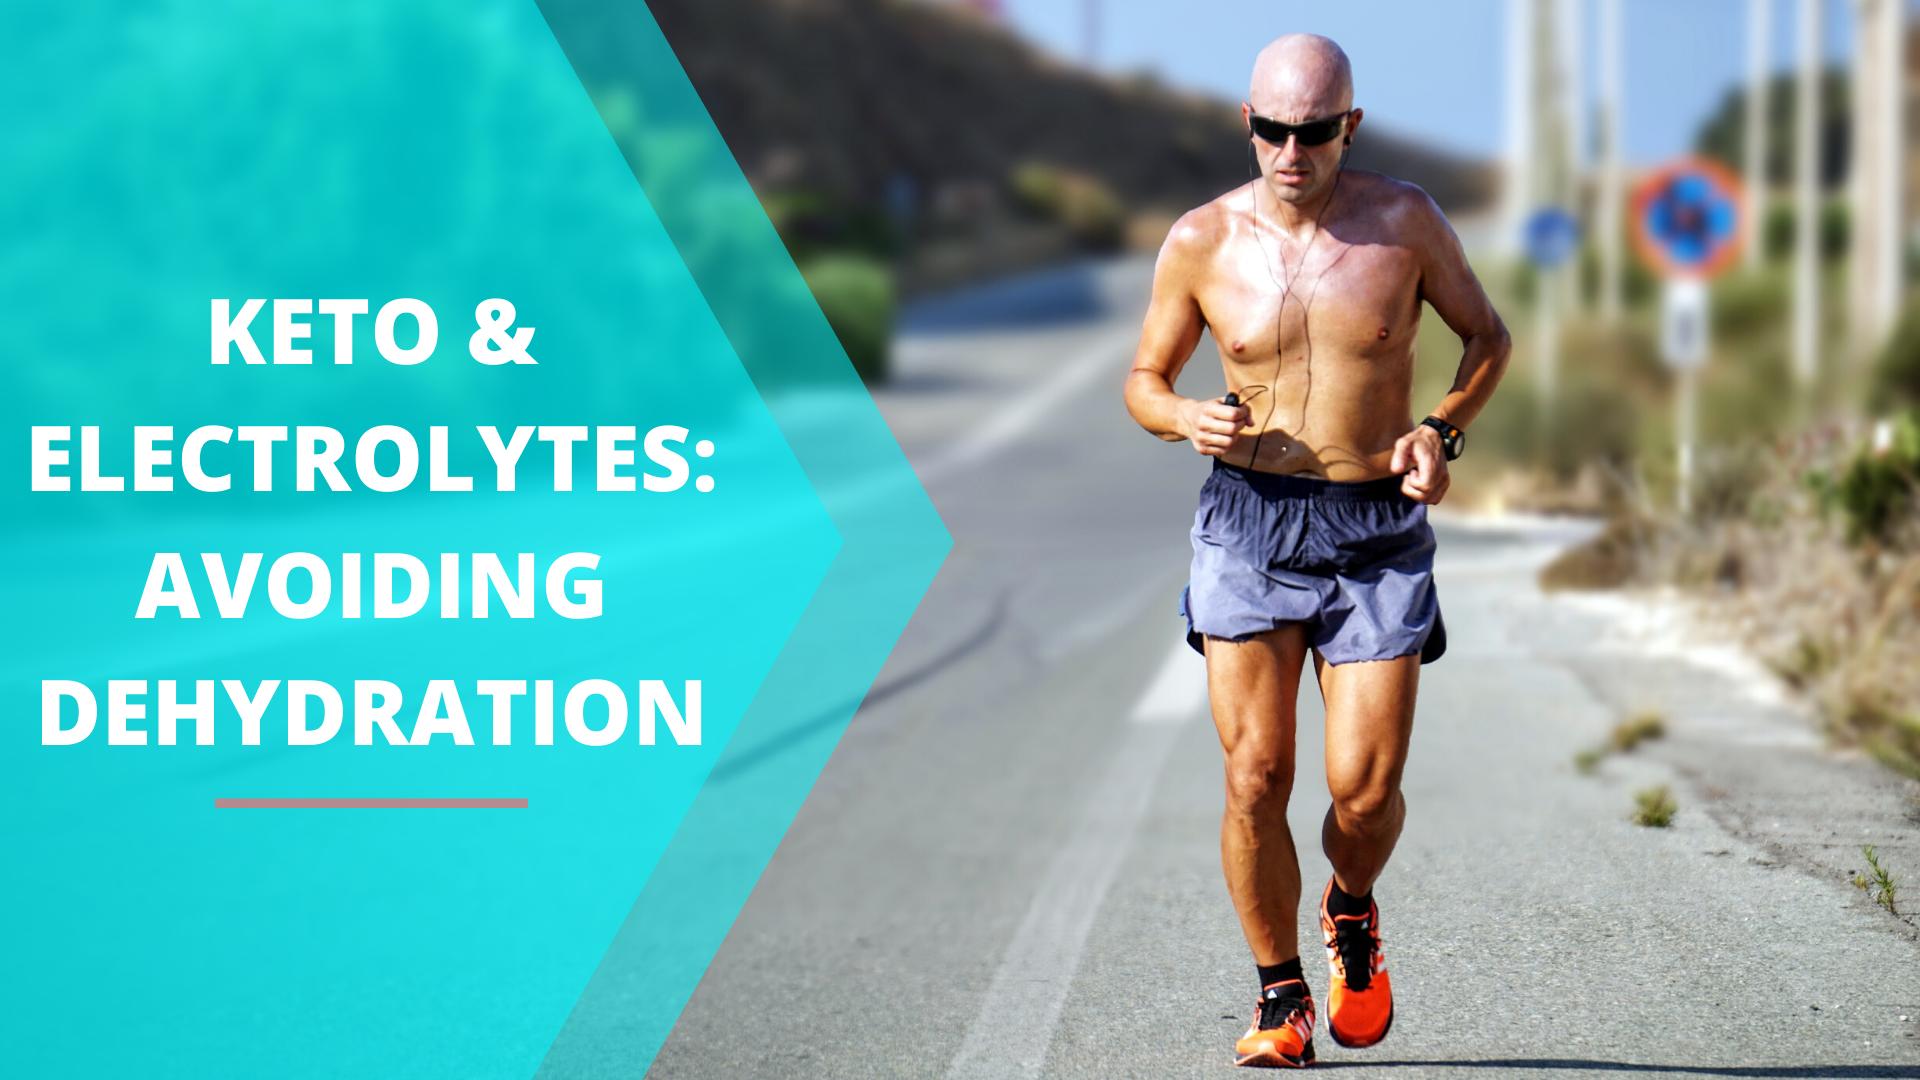 Keto & Electrolytes – Avoiding Dehydration